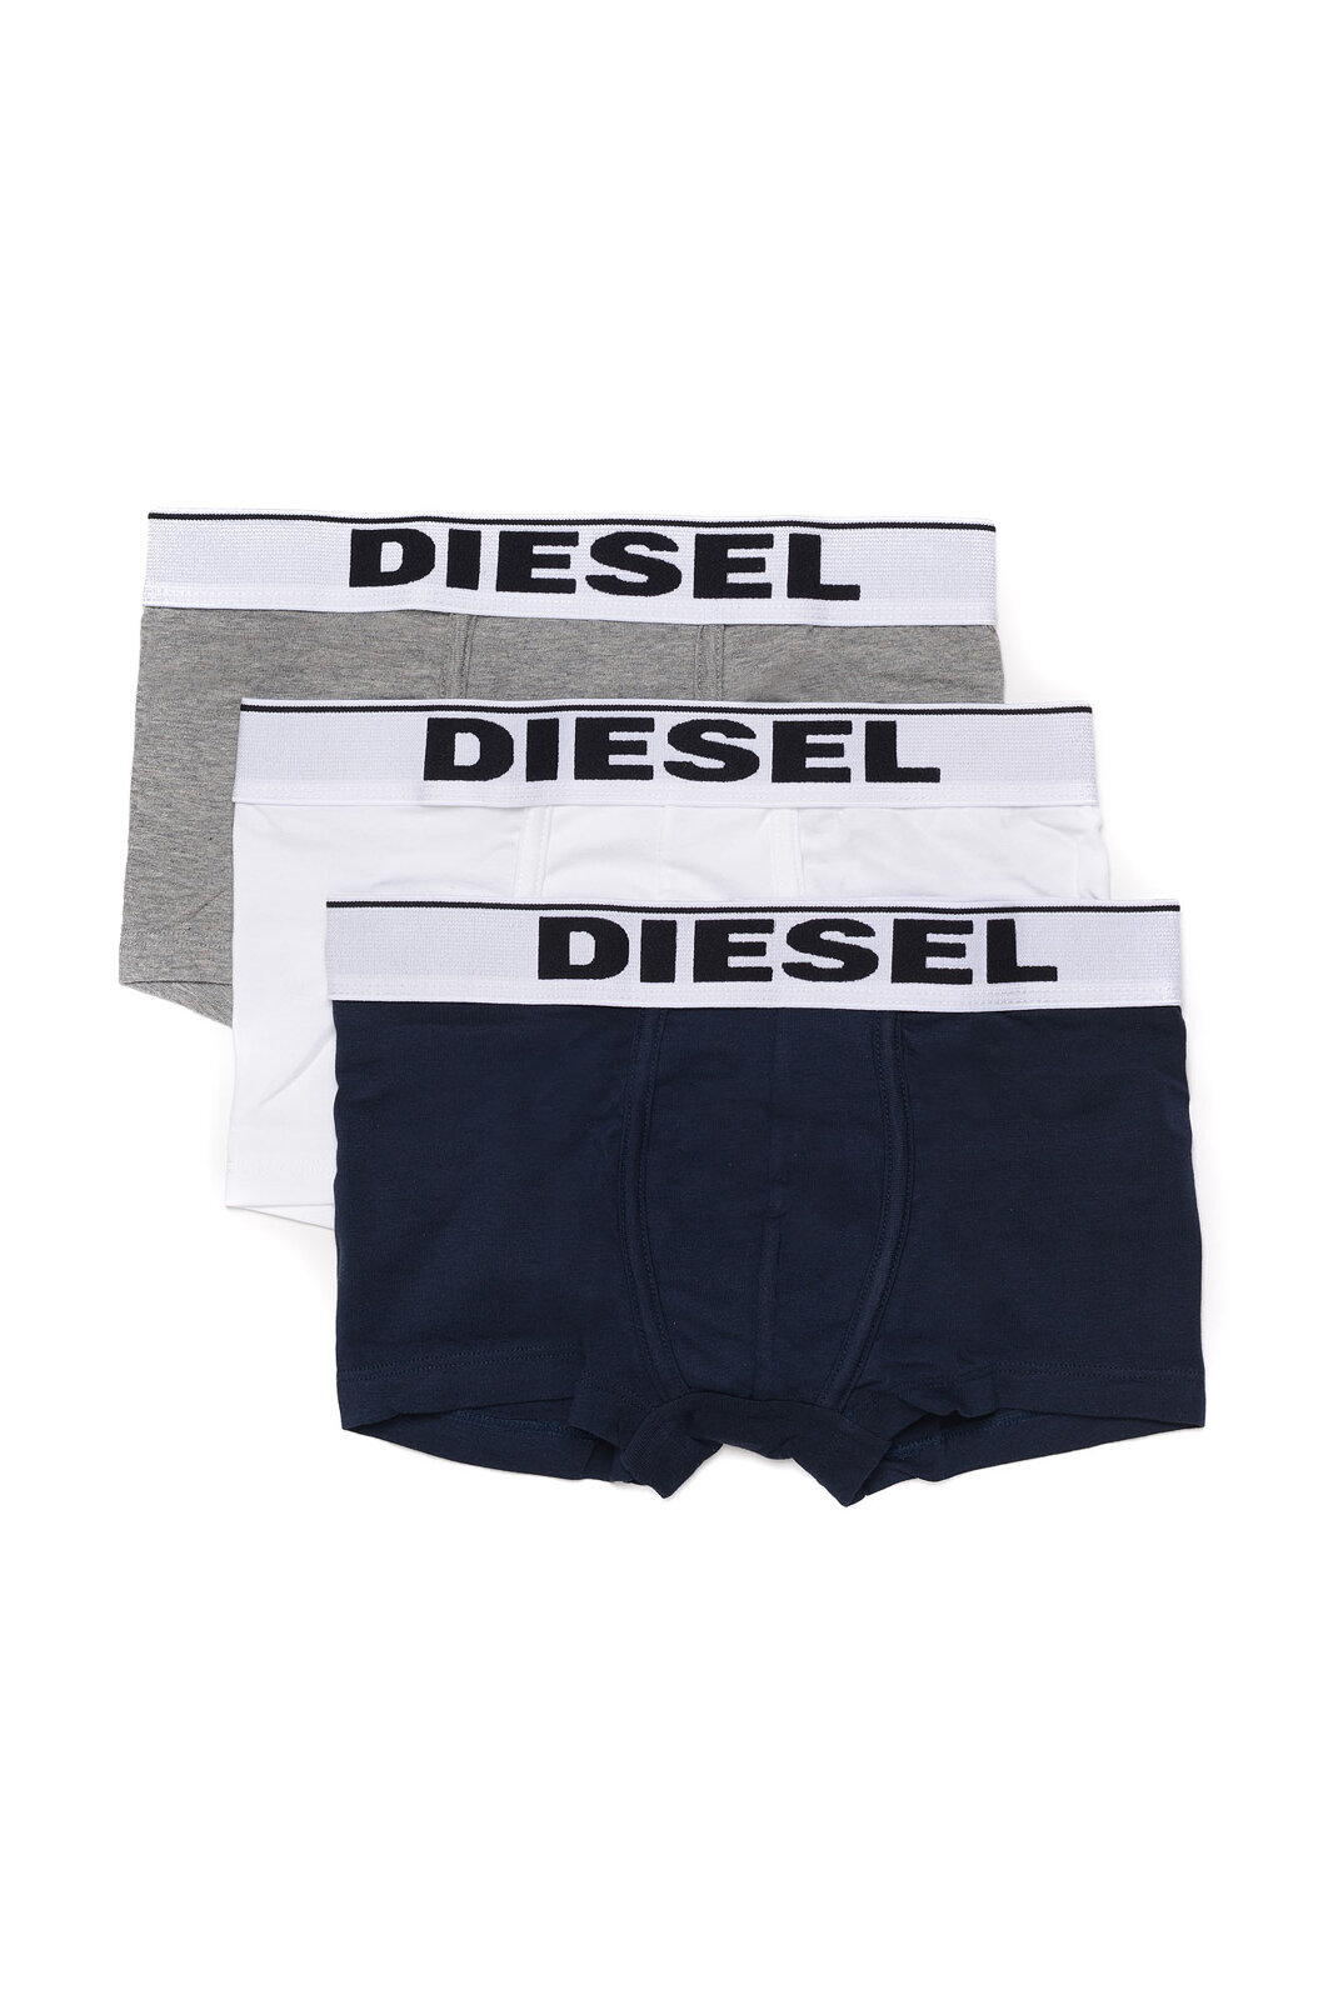 Umbx-Udamienthreepack - Diesel Kid